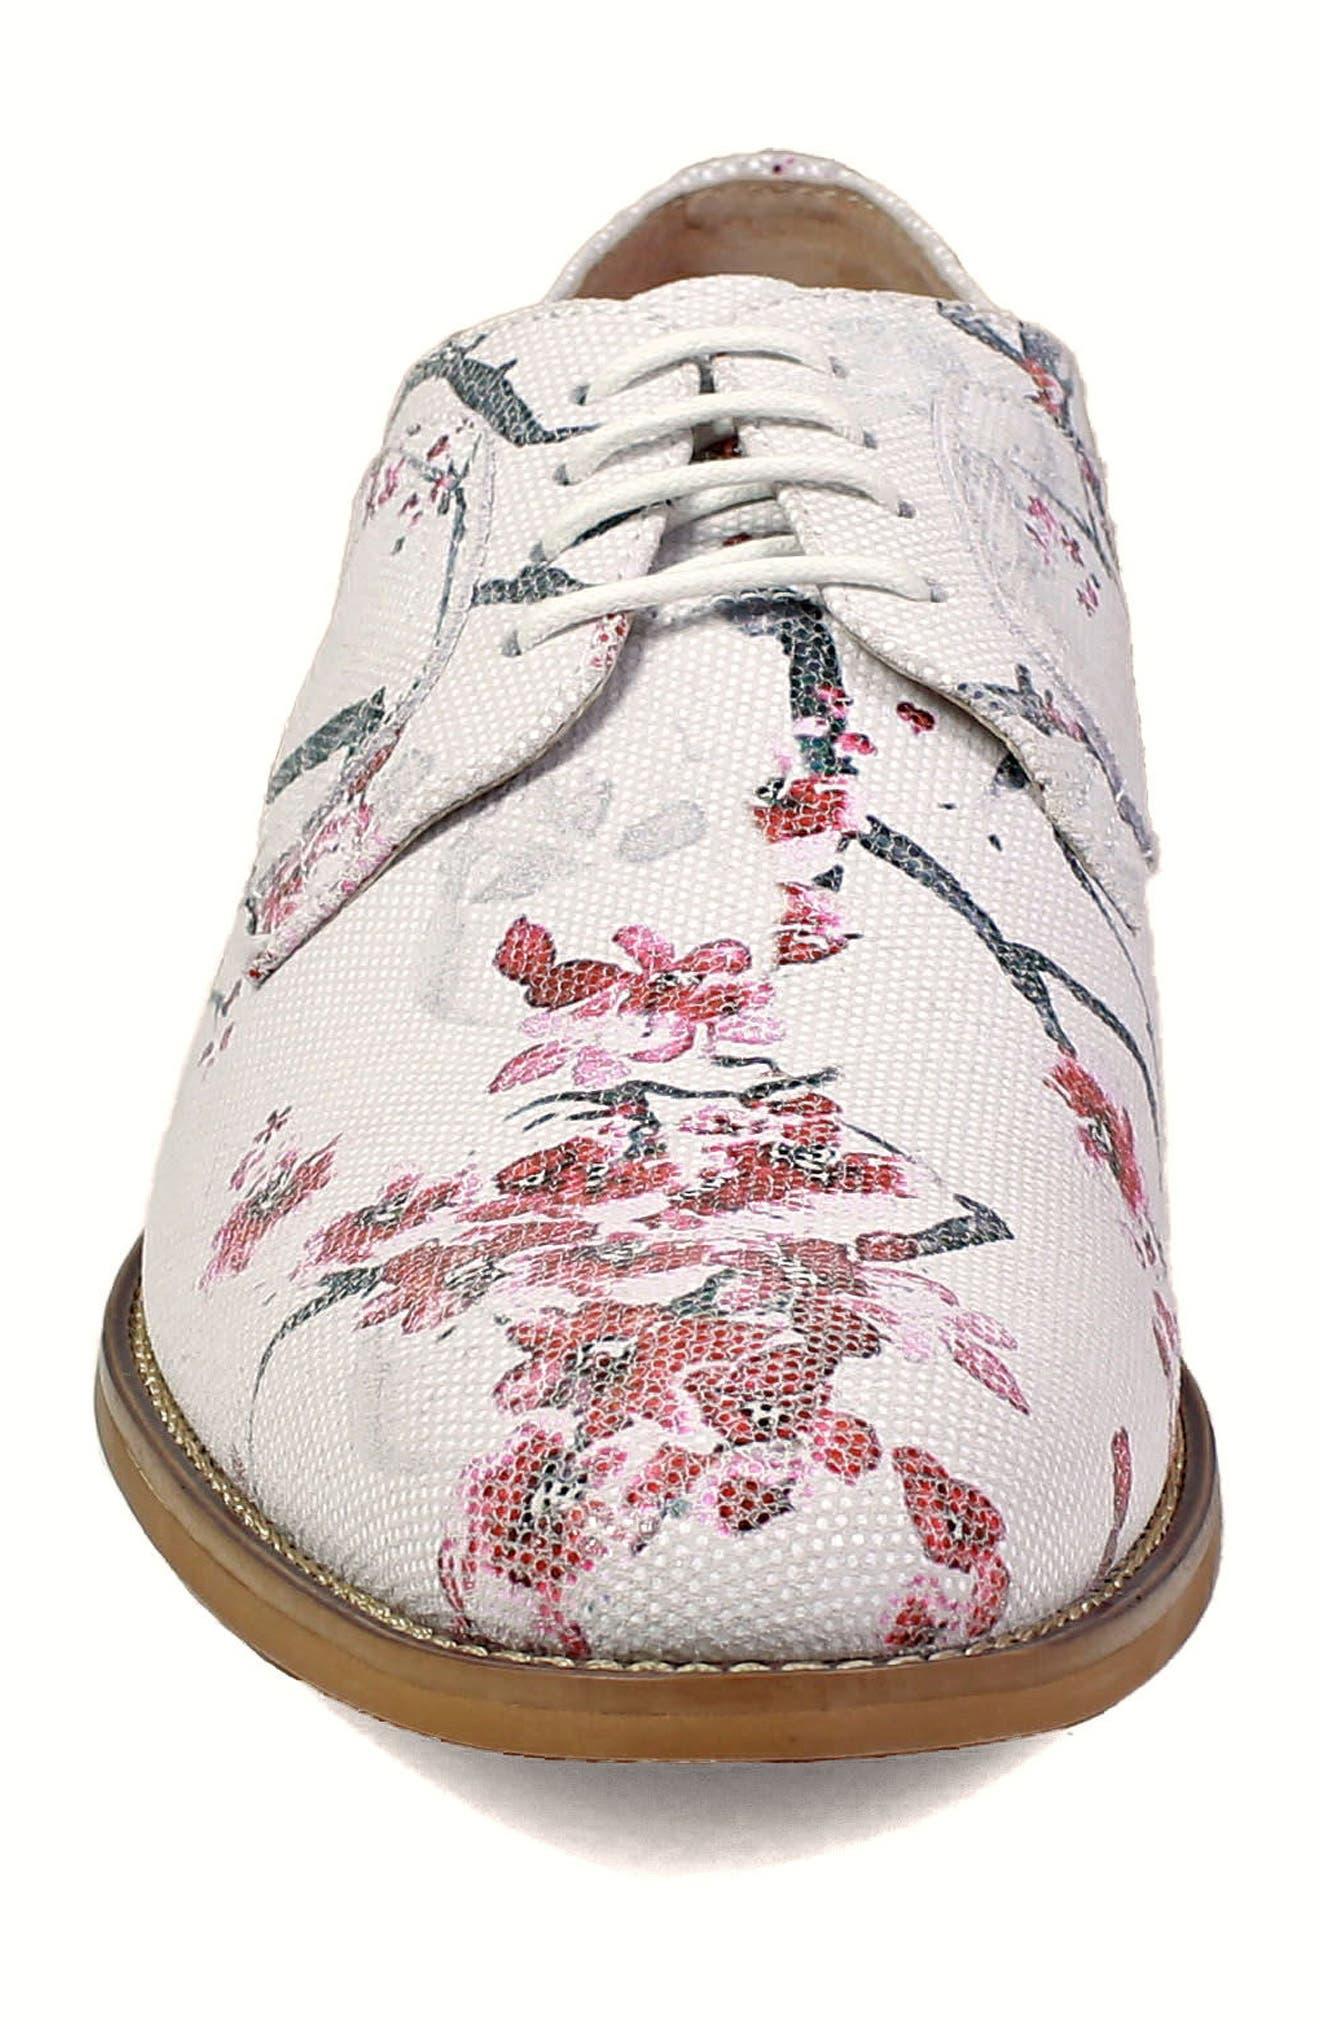 Dandy Print Plain Toe Derby,                             Alternate thumbnail 4, color,                             White Leather